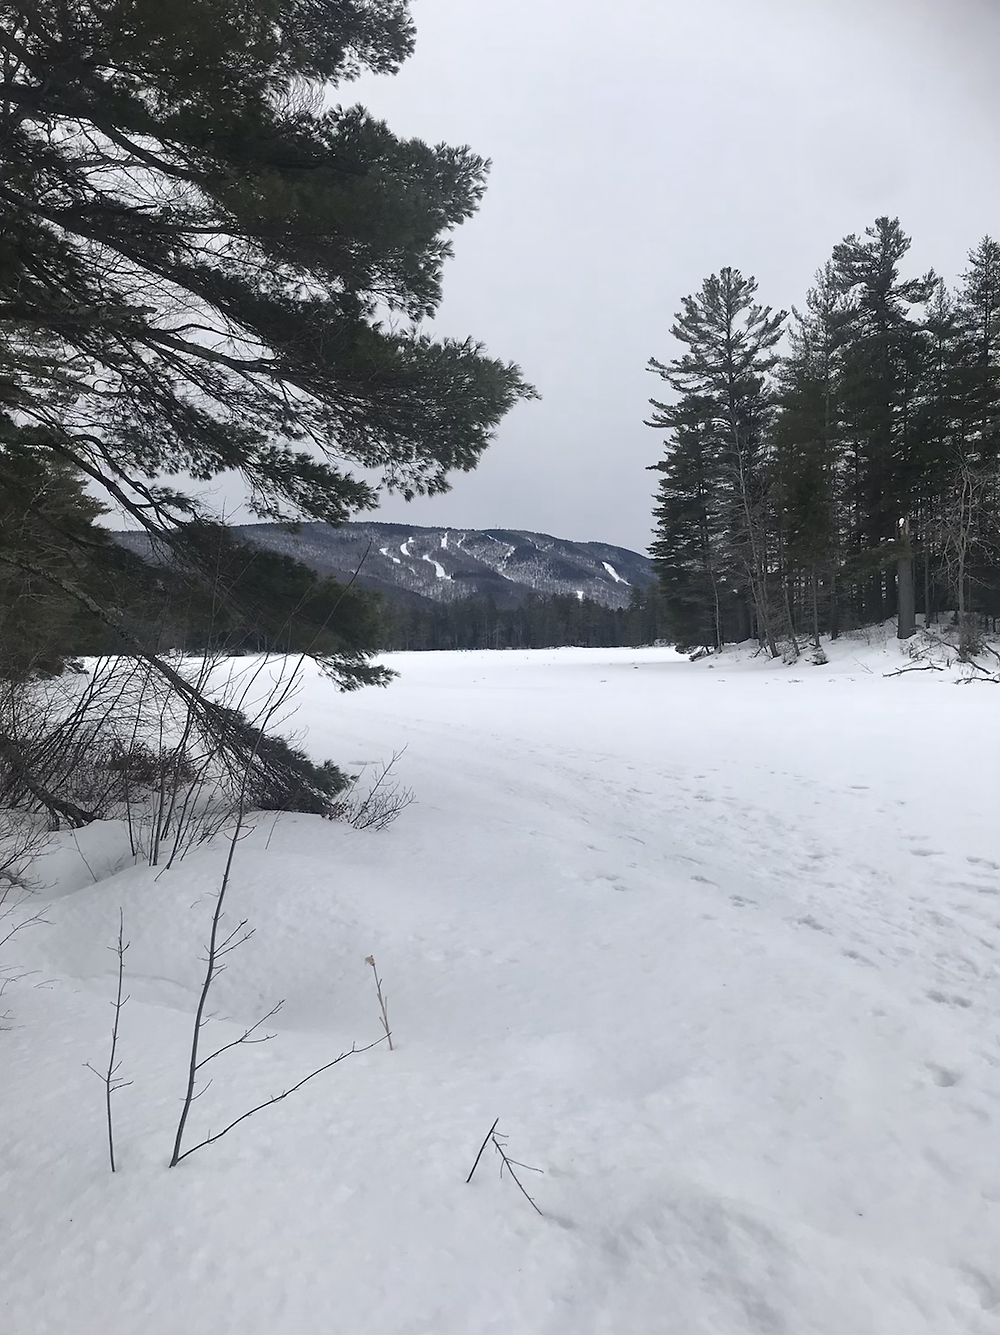 The frozen Lowell Lake